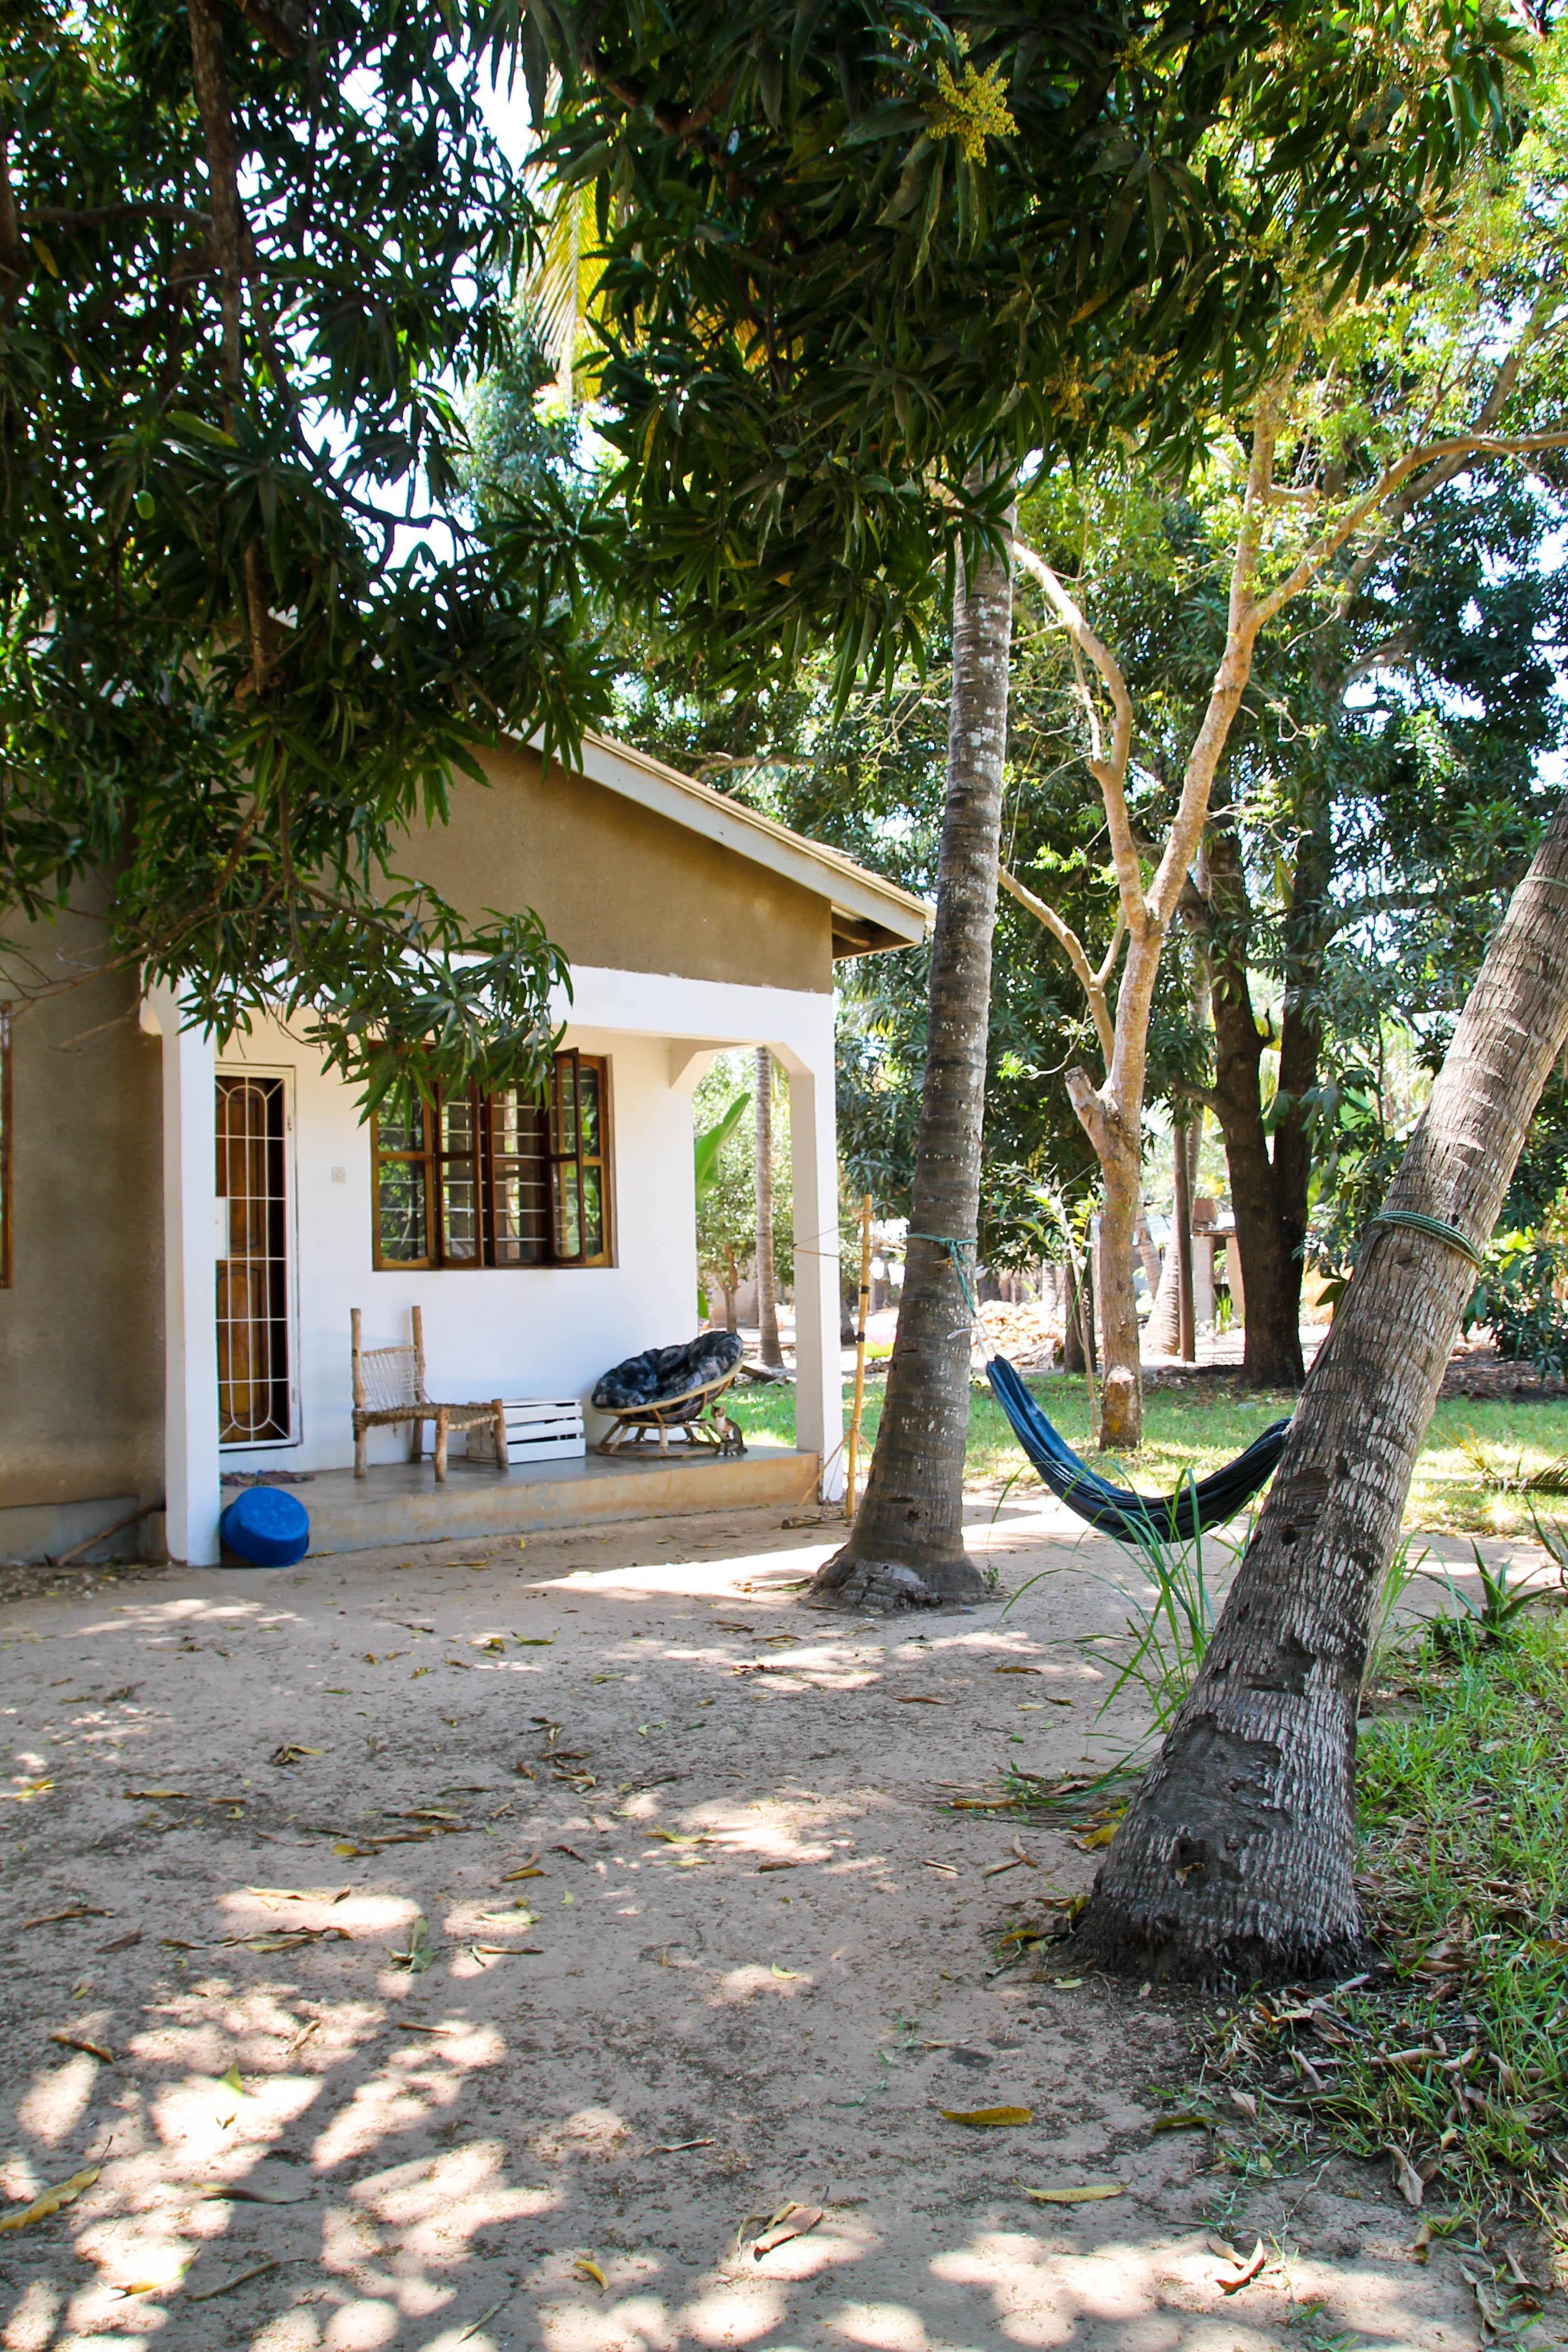 Dar es Salaam Beach